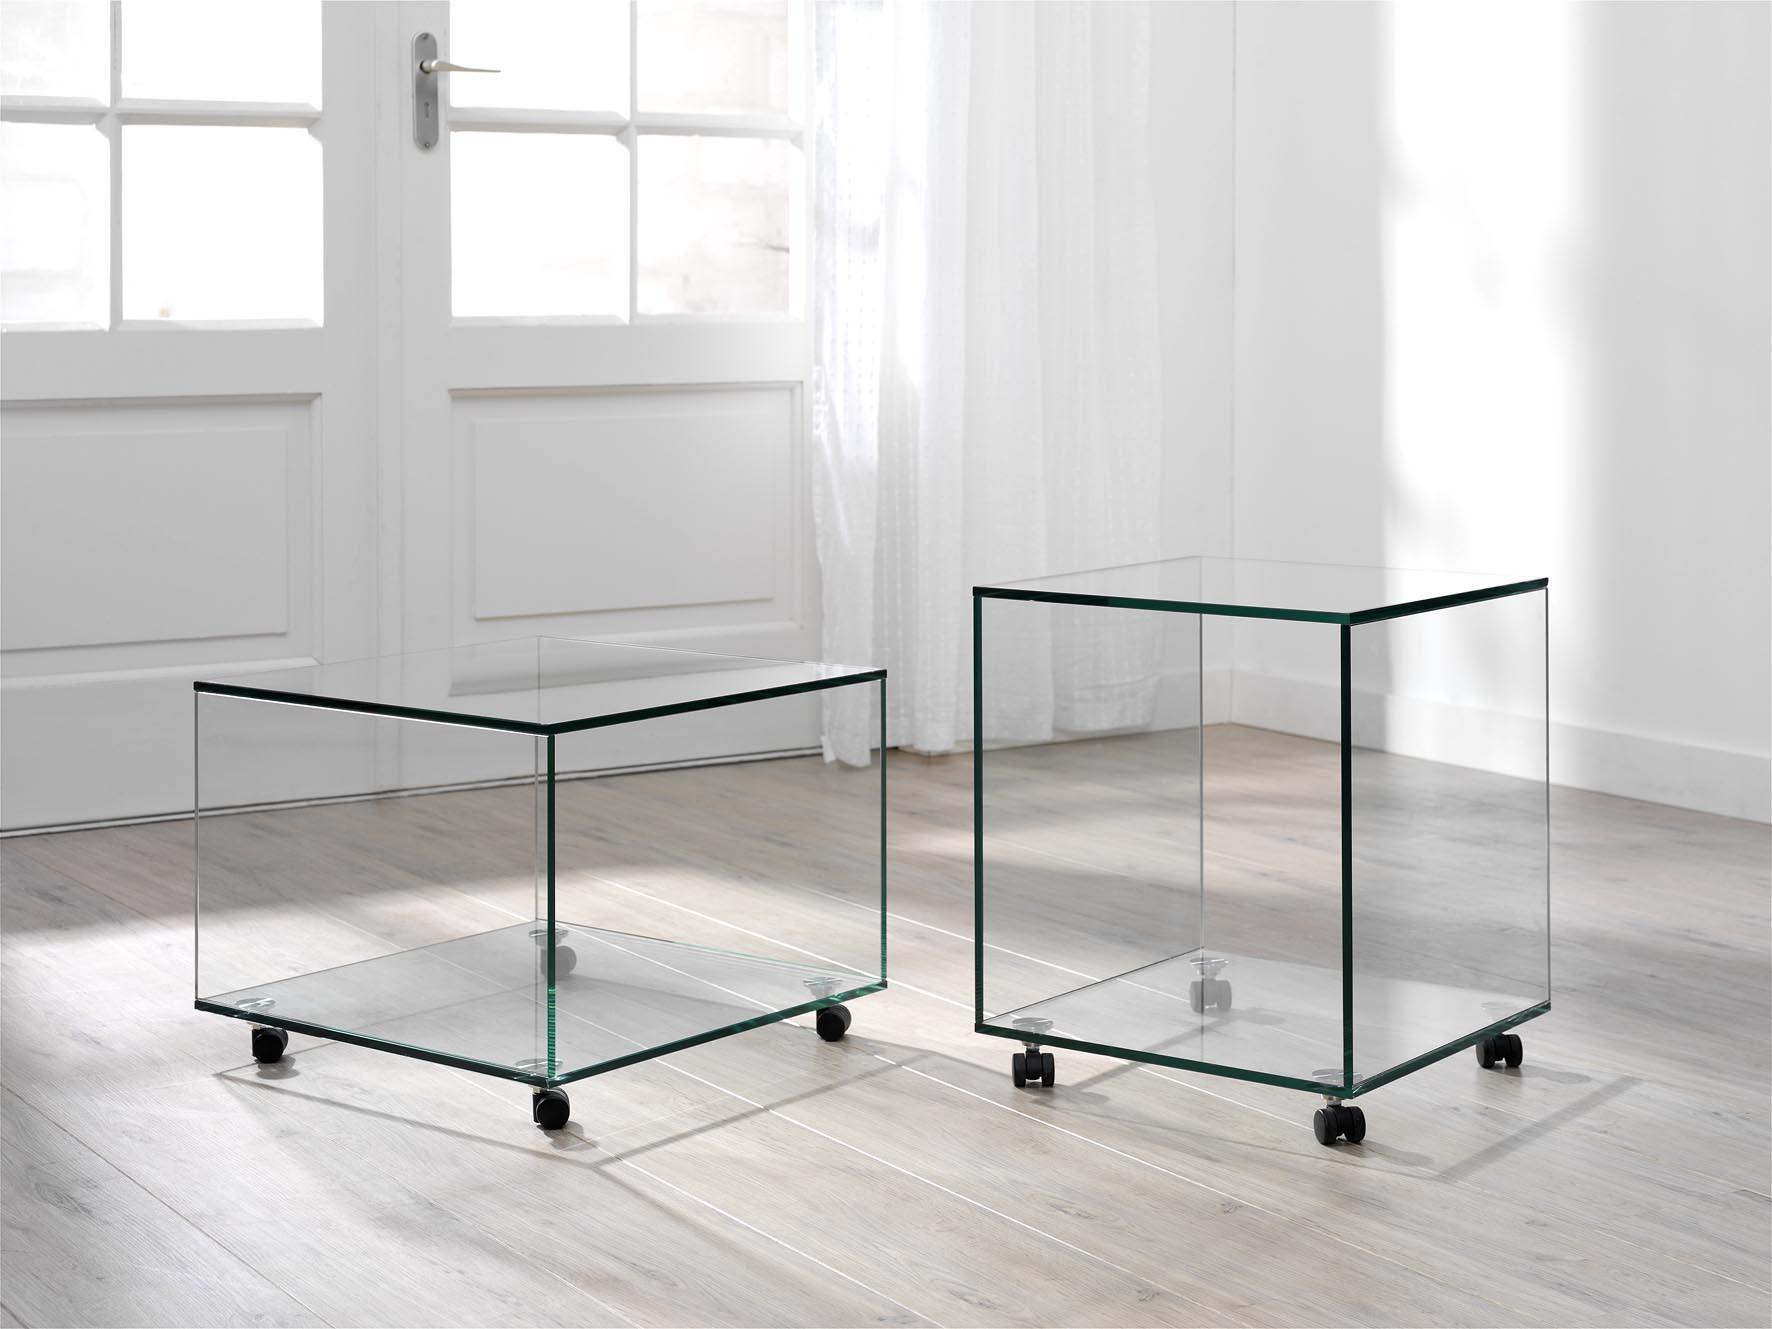 Mooie Glazen Bijzettafels.Glazen Bijzettafel Vidre Glastoepassingen